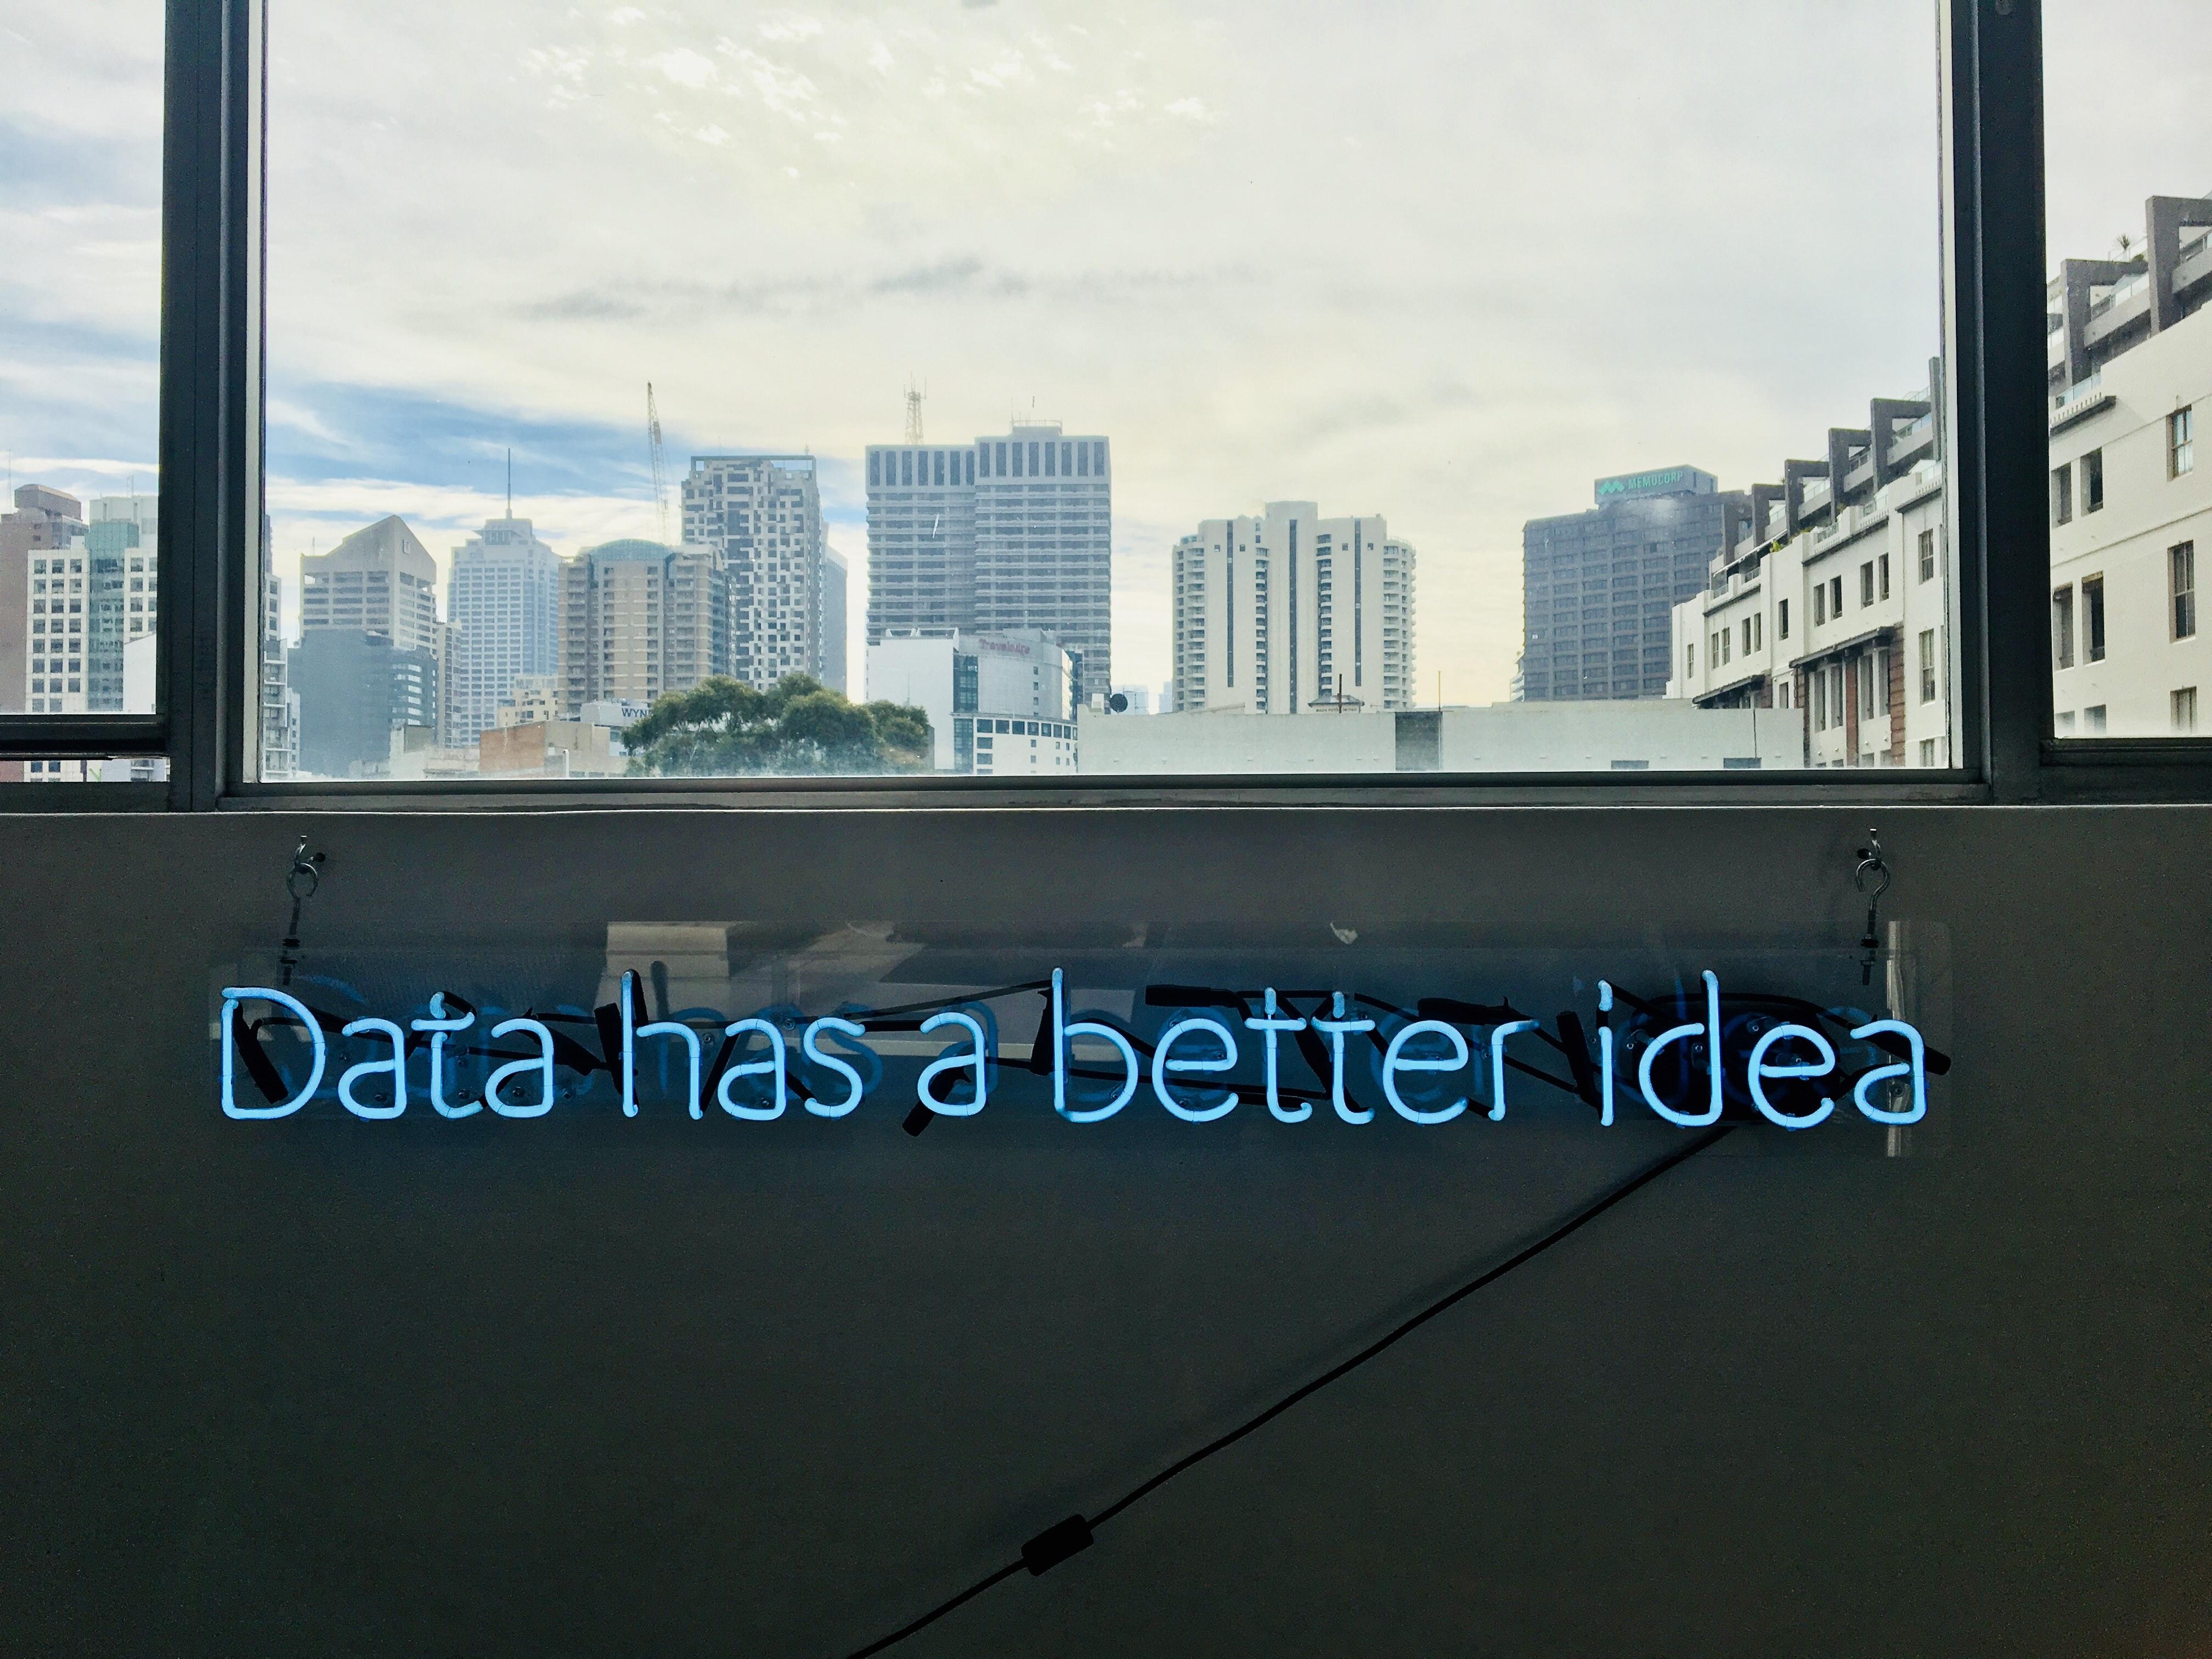 Neon sign reading data has a better idea